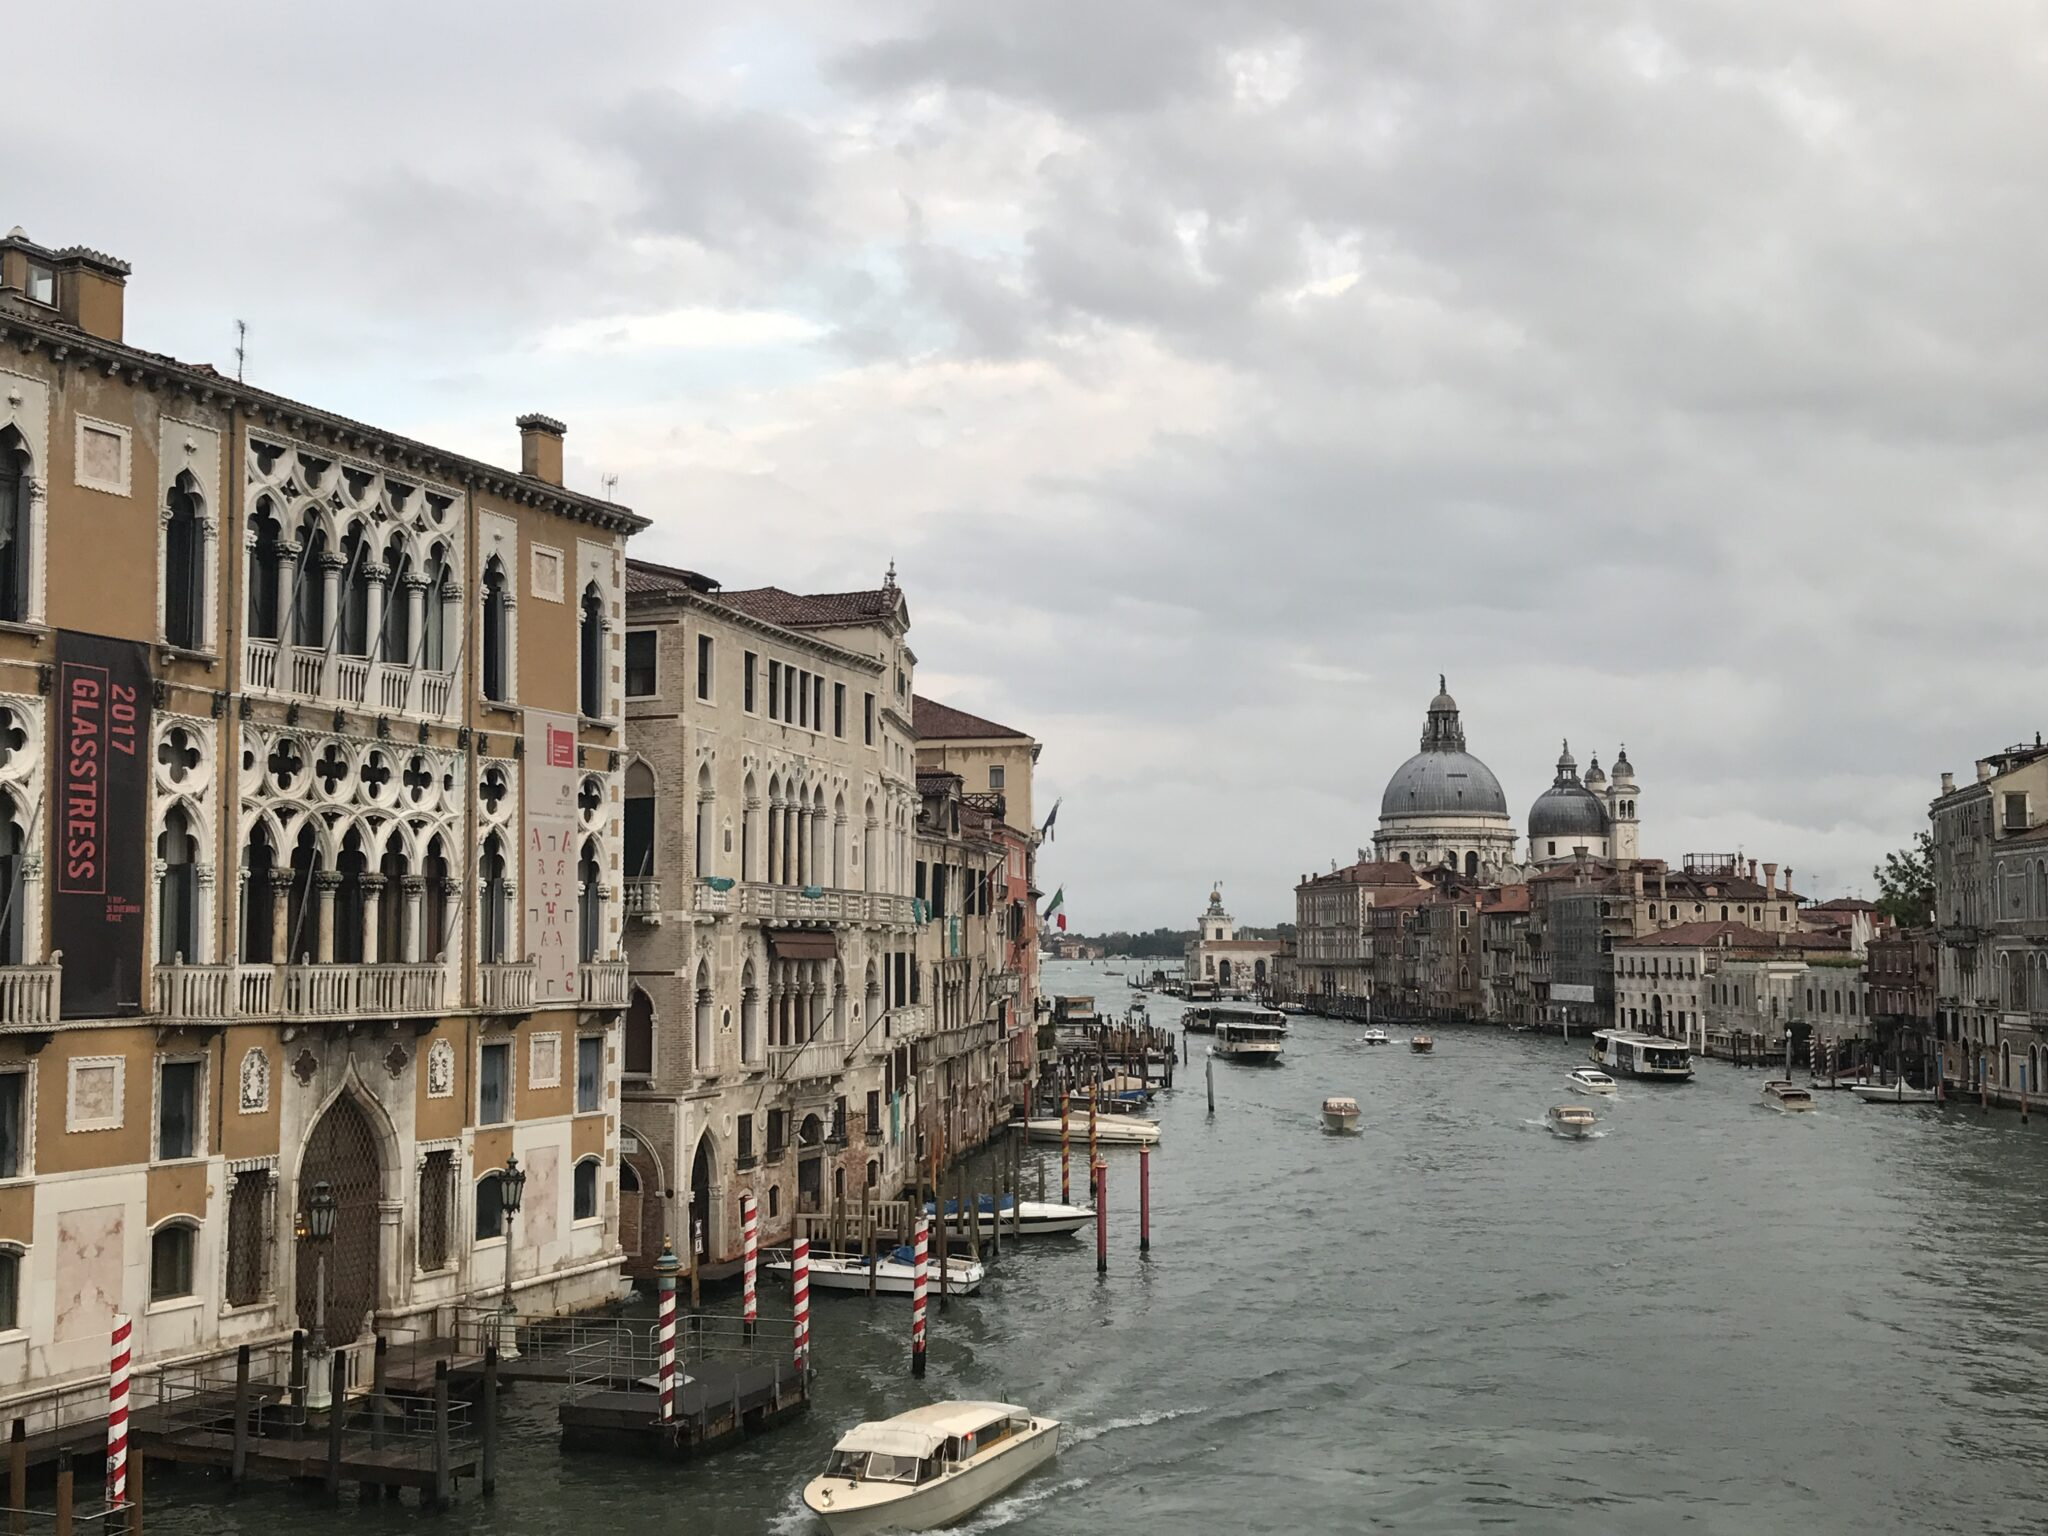 2017 – Venice Day 1